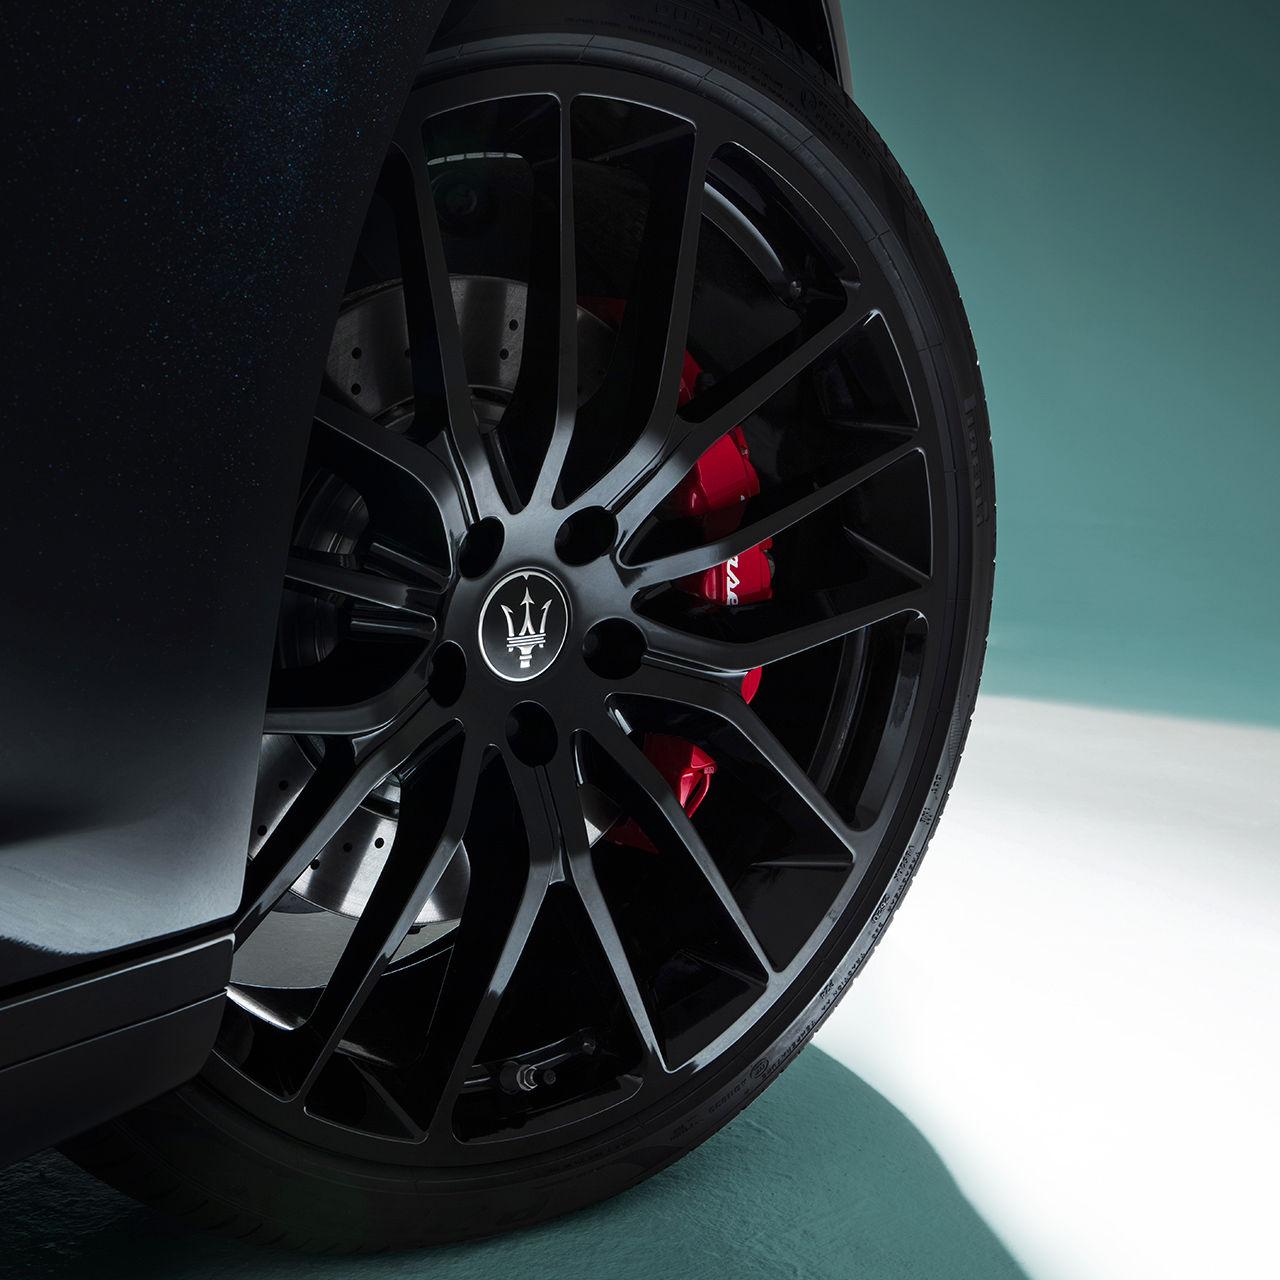 Maserati Ghibli - Rad mit roten Bremssätteln